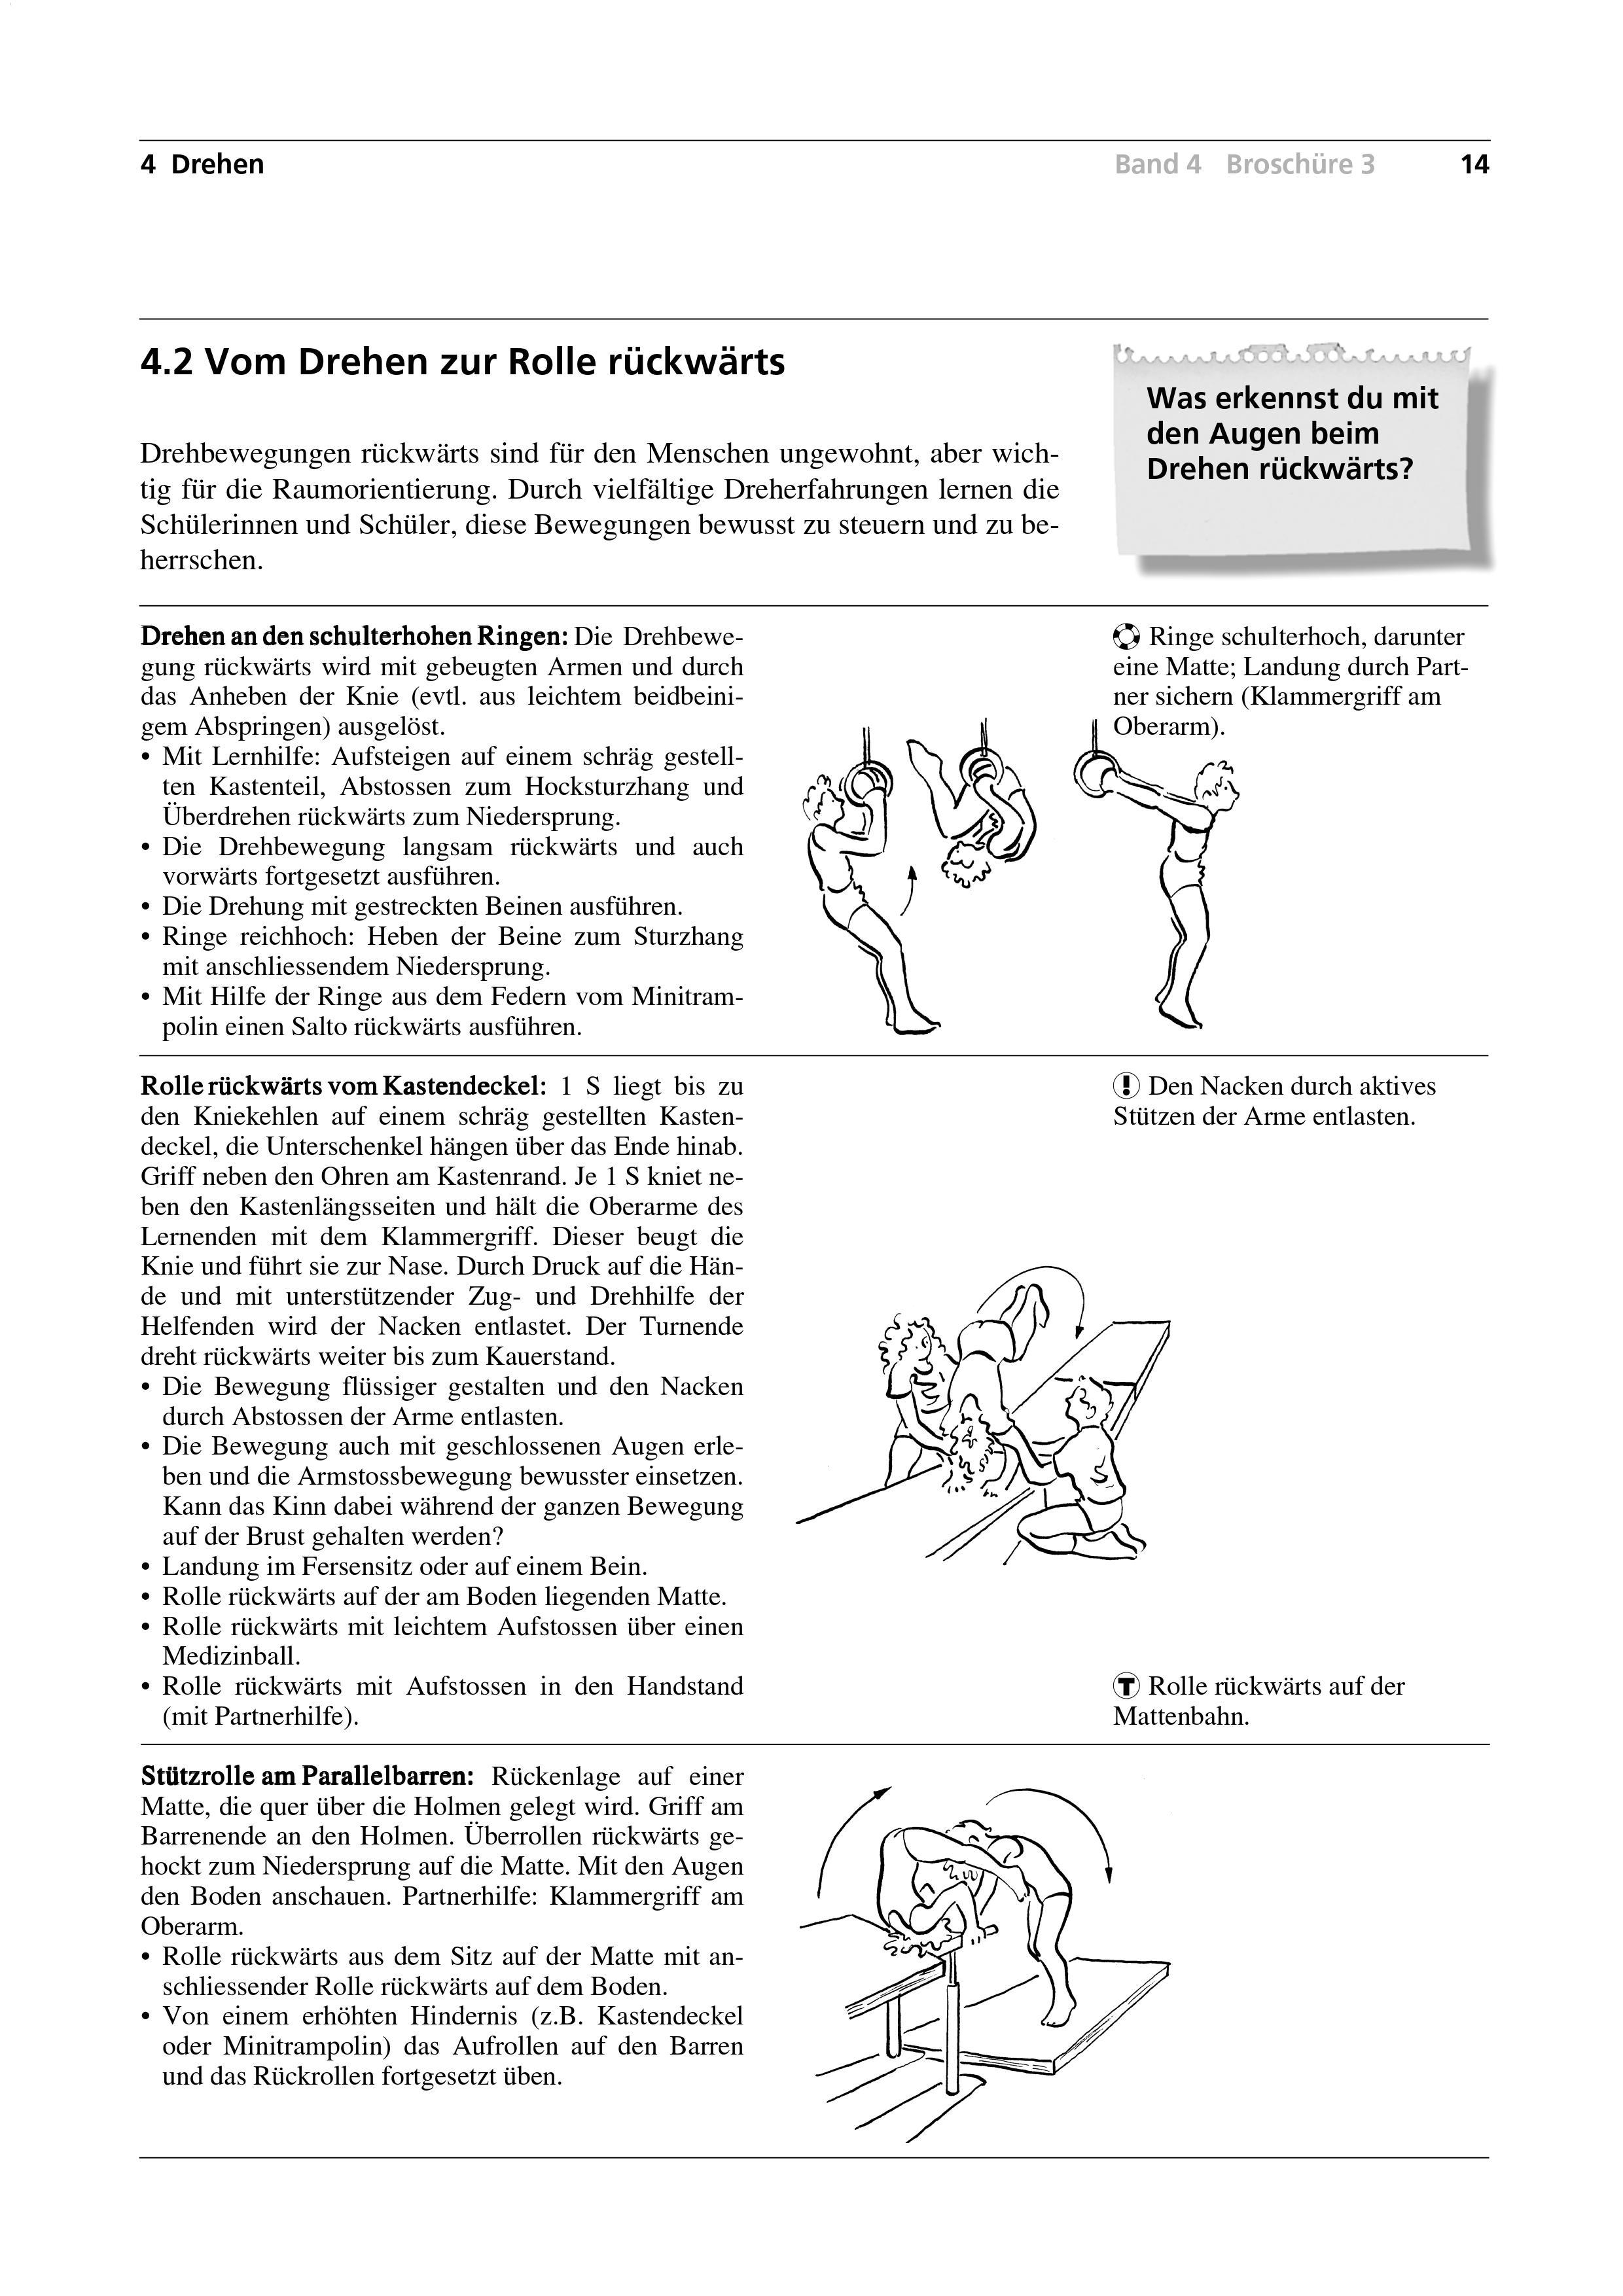 Preview image for LOM object Vom Drehen zur Rolle rückwärts